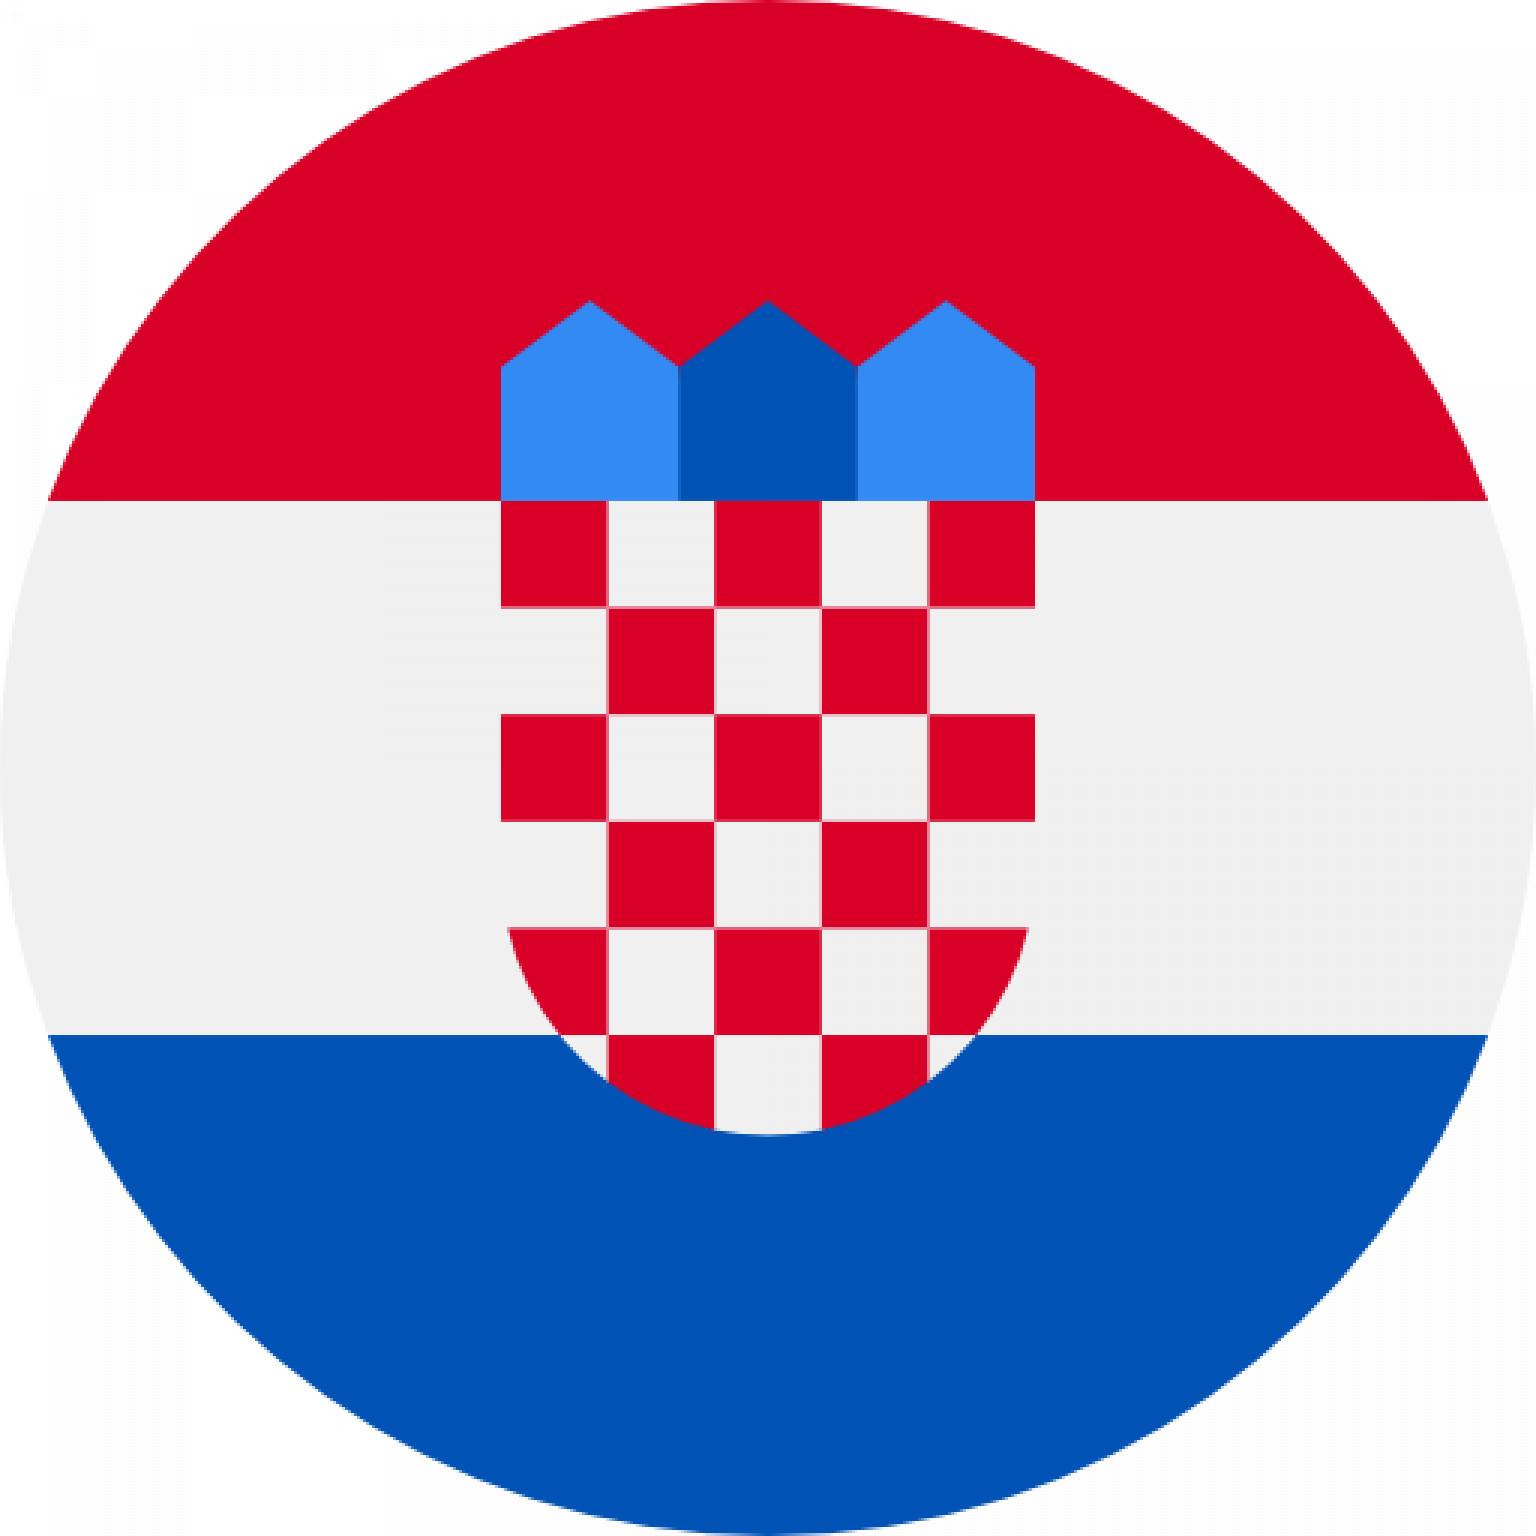 Flag of Croatia and P2P Lending